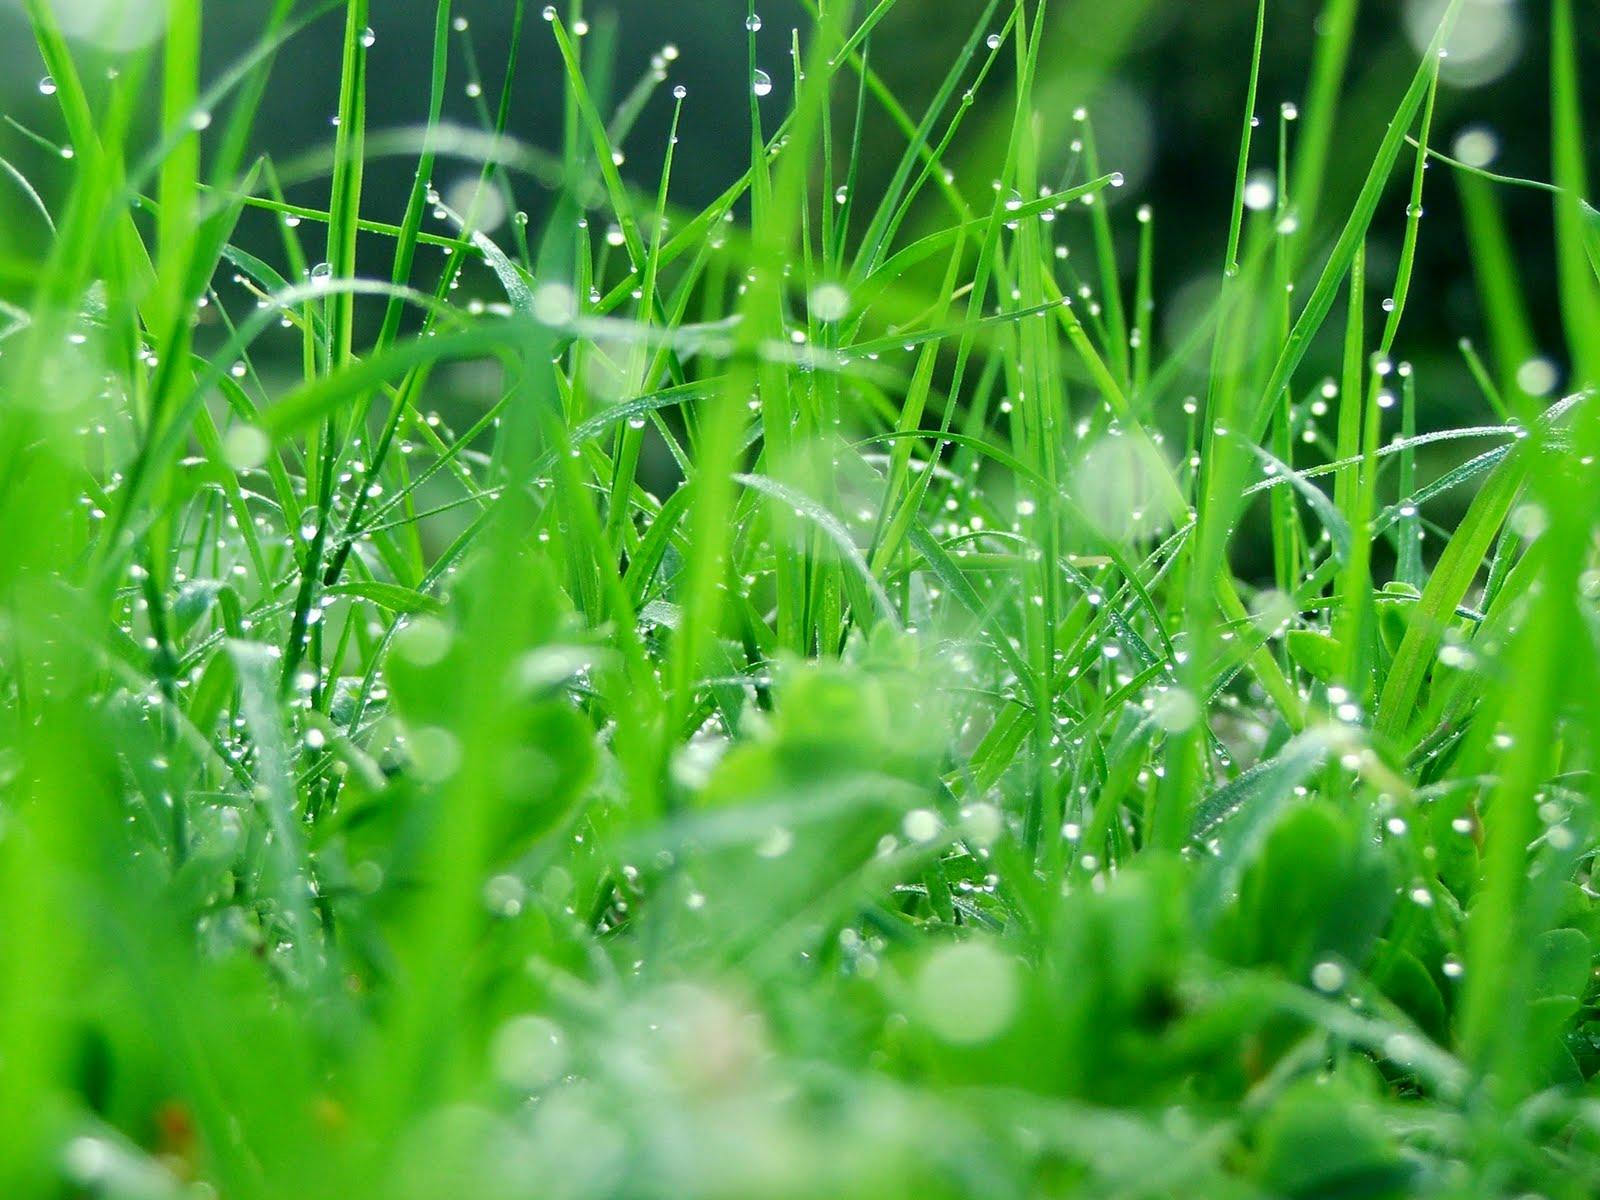 http://2.bp.blogspot.com/-w5YCde0wcN4/TbrUgSbraqI/AAAAAAAAA_Q/0kzHLxj4VXw/s1600/desktop-green-wallpaper.jpg